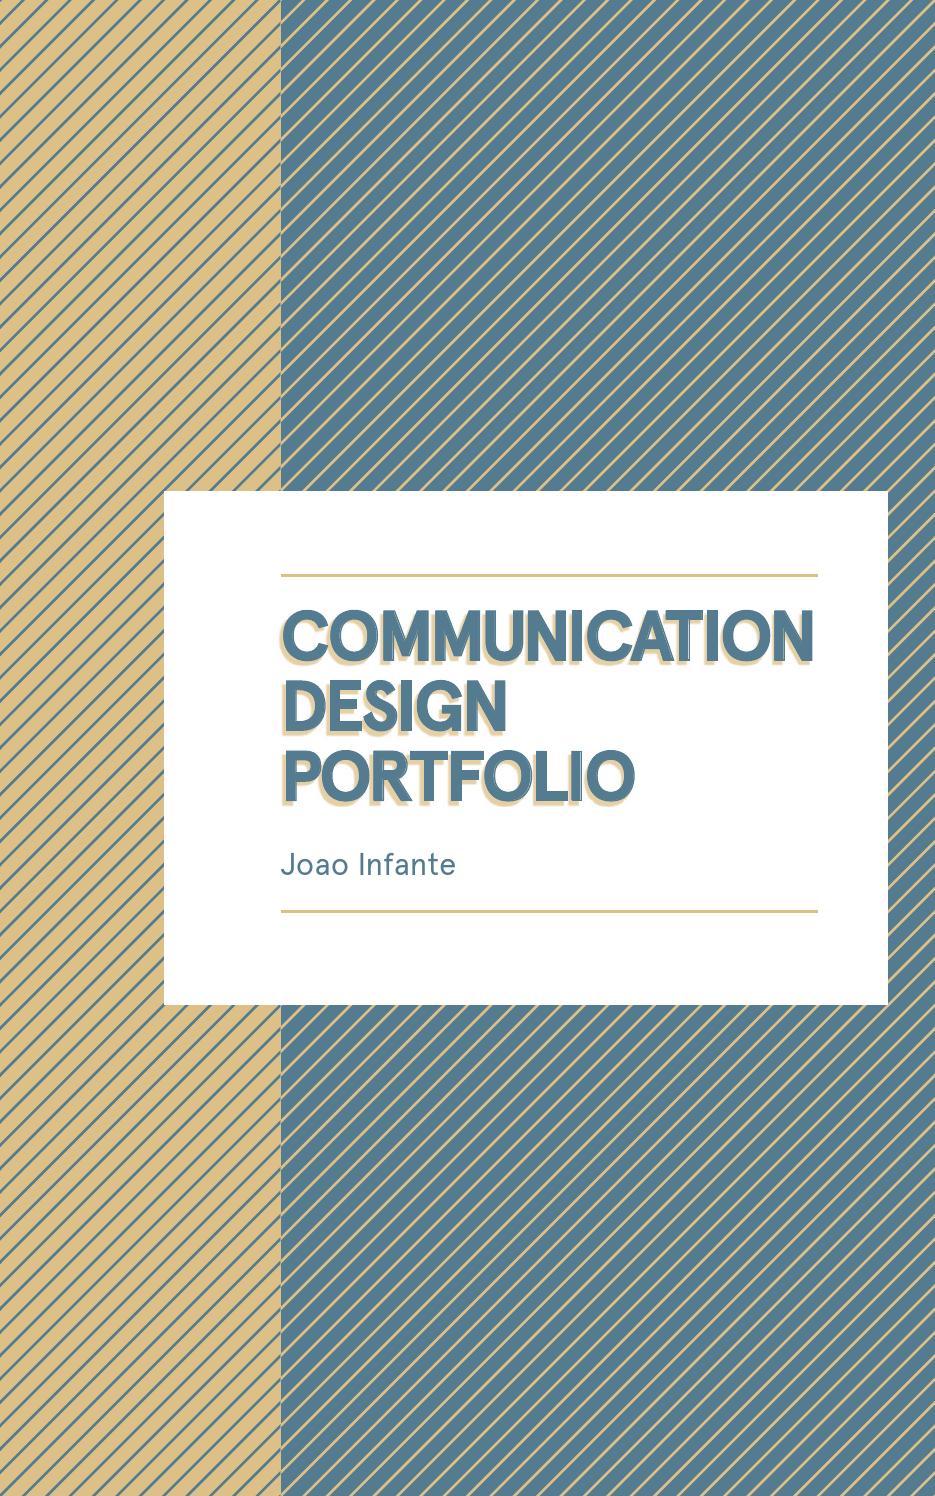 Communication Design Portfolio By Joao Infante Issuu